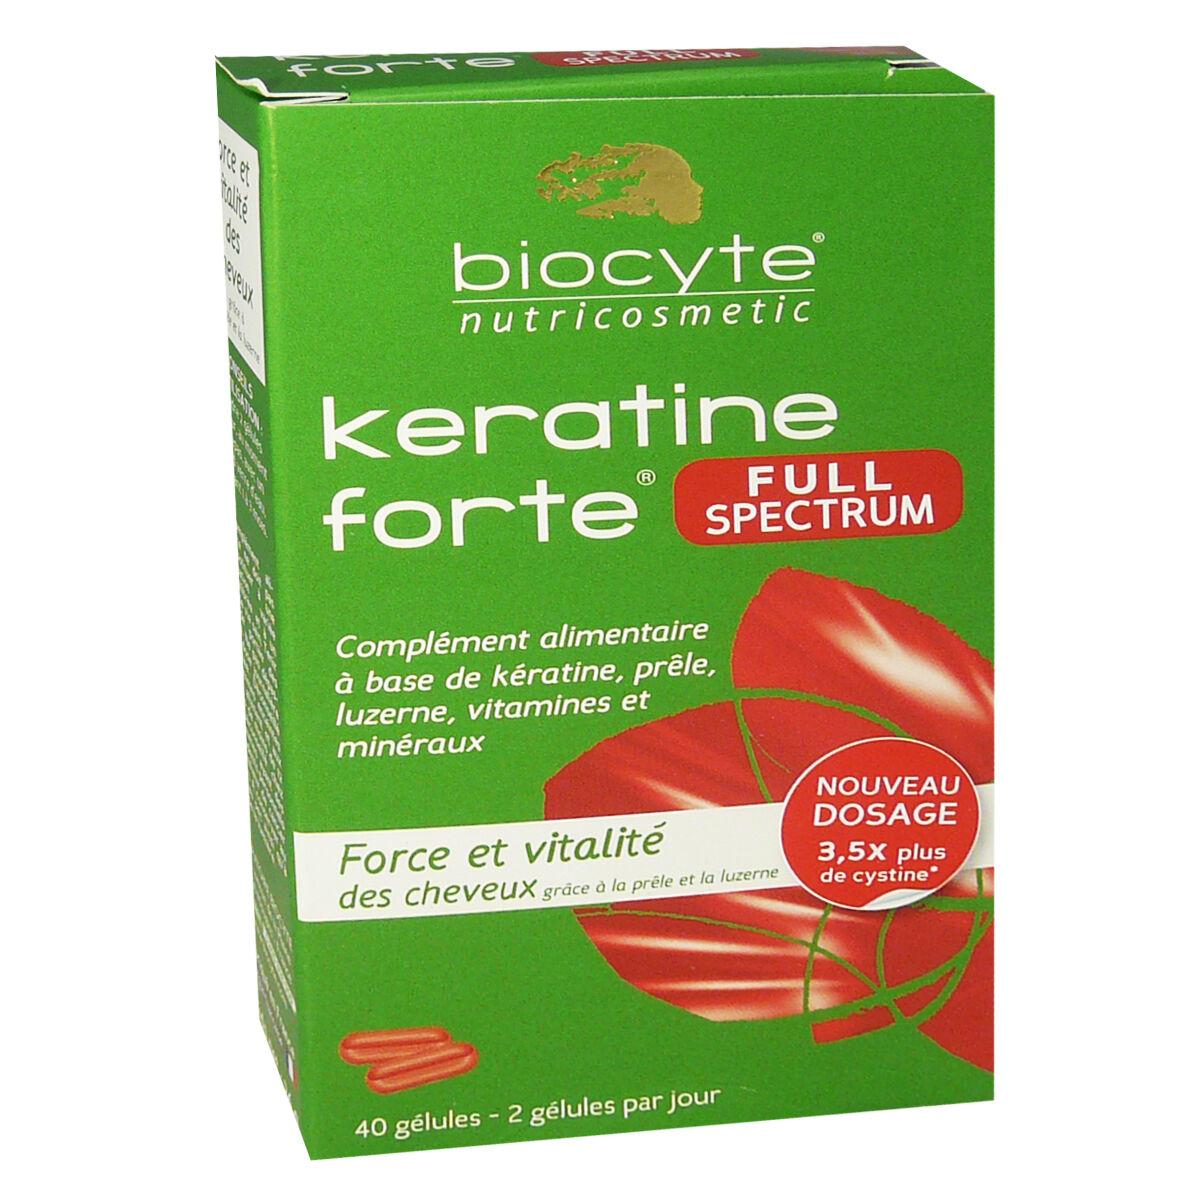 Biocyte keratine forte force & vitalite cheveux 40 gelules